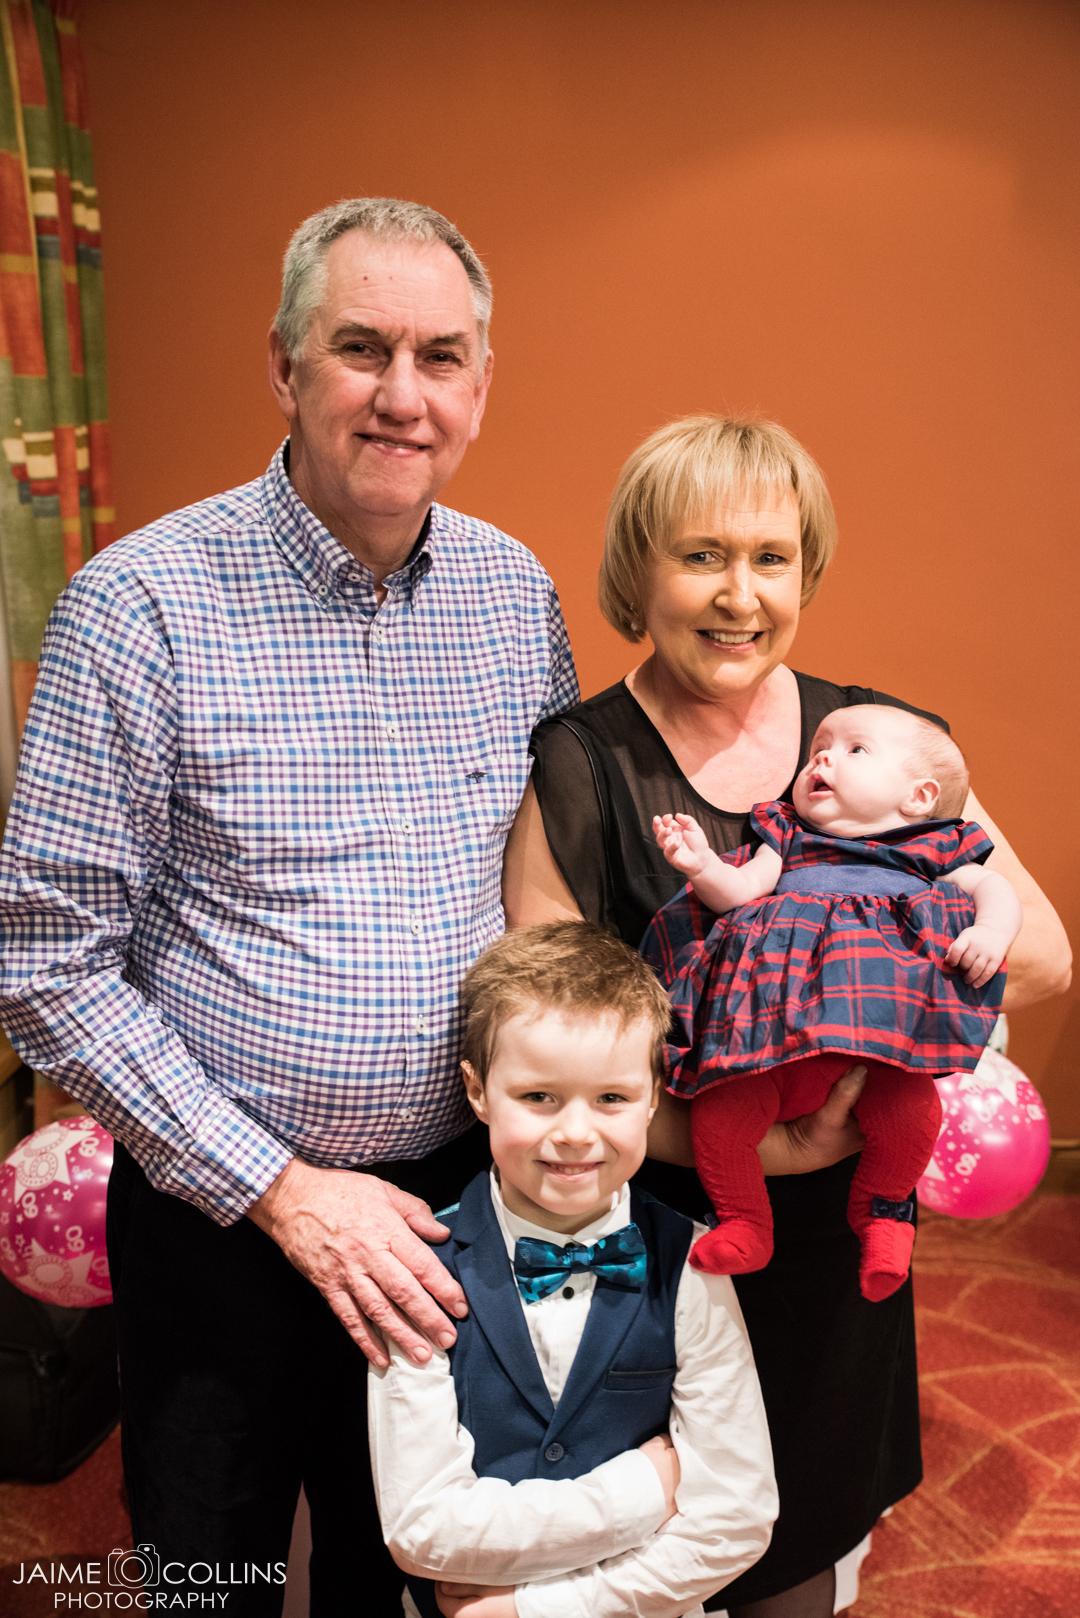 My parents and their Godchildren